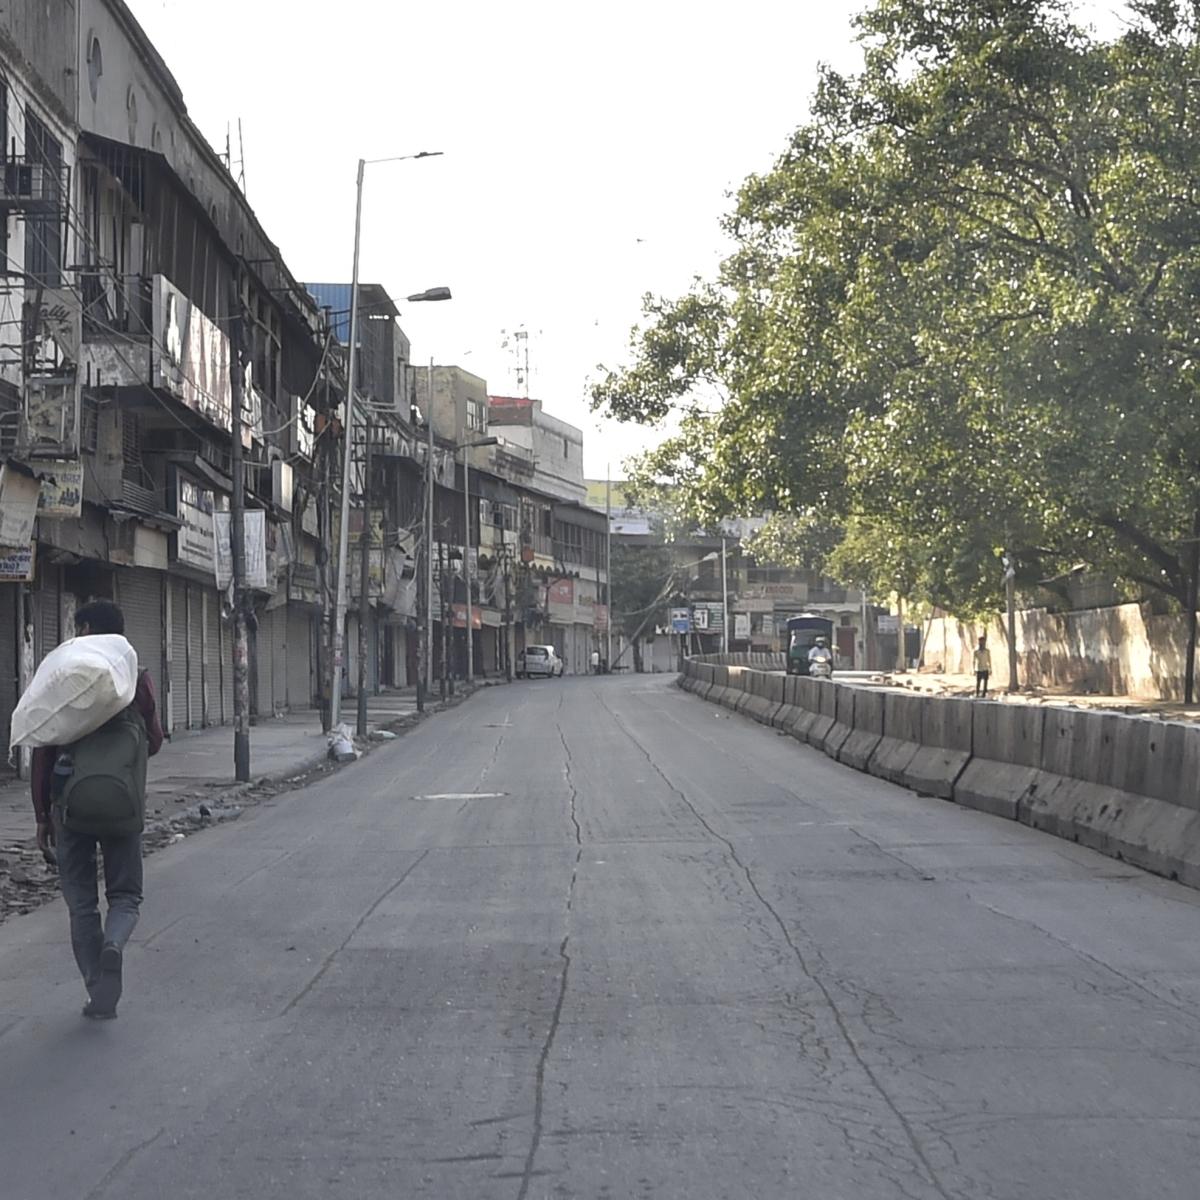 COVID-19: Delhi govt mulling lockdown extension, say sources